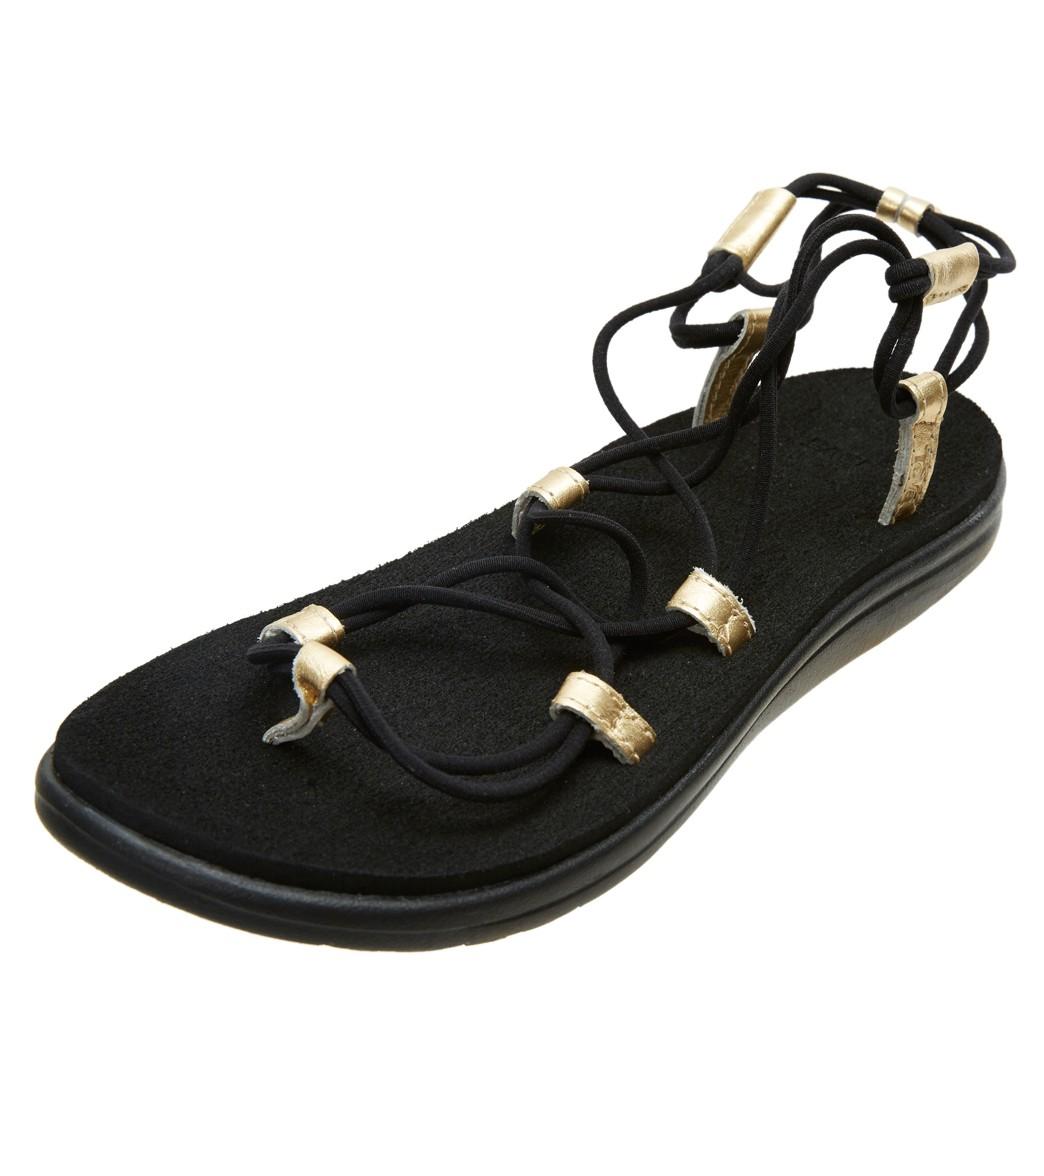 ba8a6ec03e14 Teva Voya Infinity Metallic Sandal at SwimOutlet.com